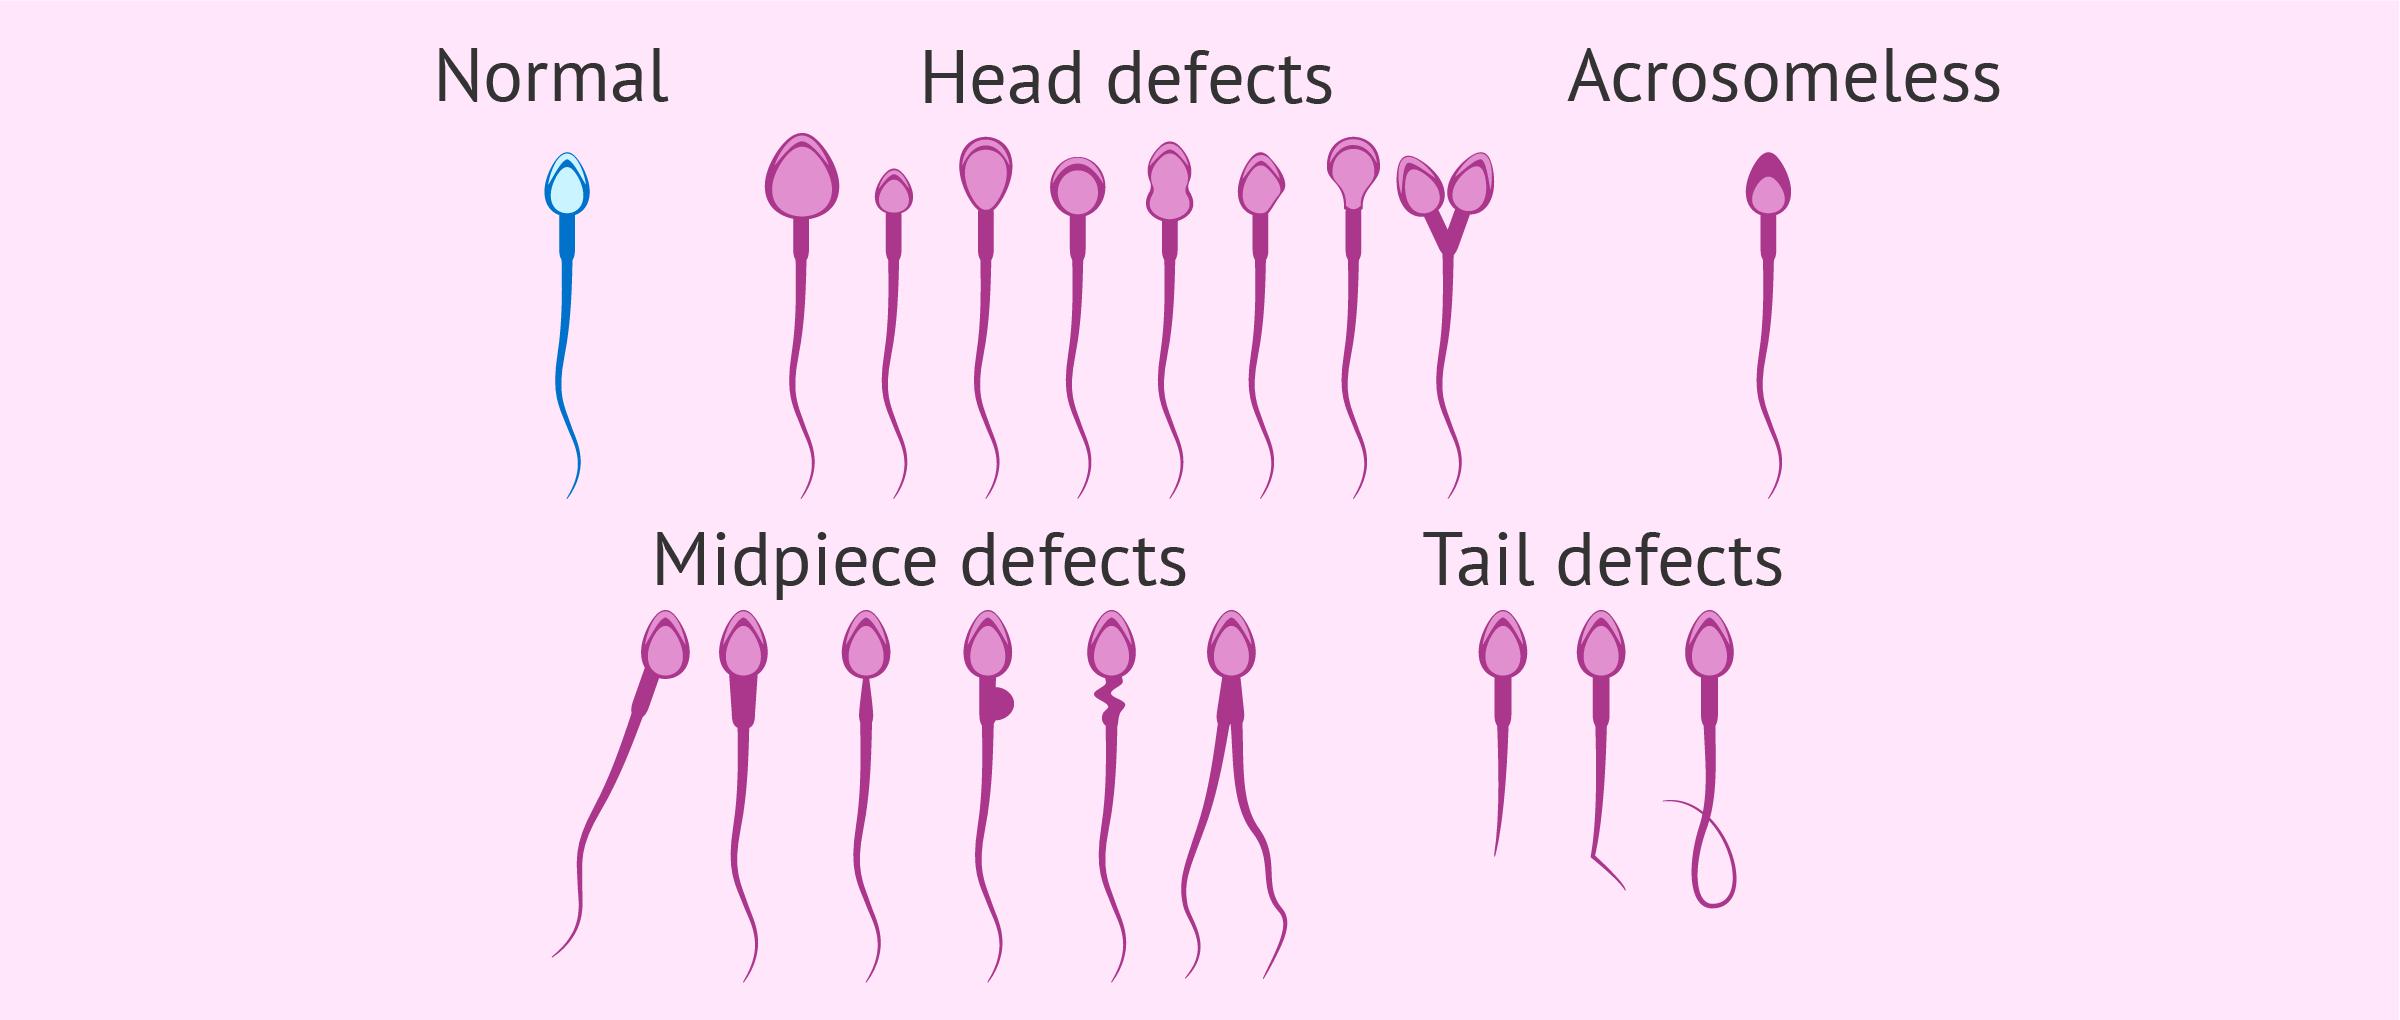 Types of sperm morphology alterations